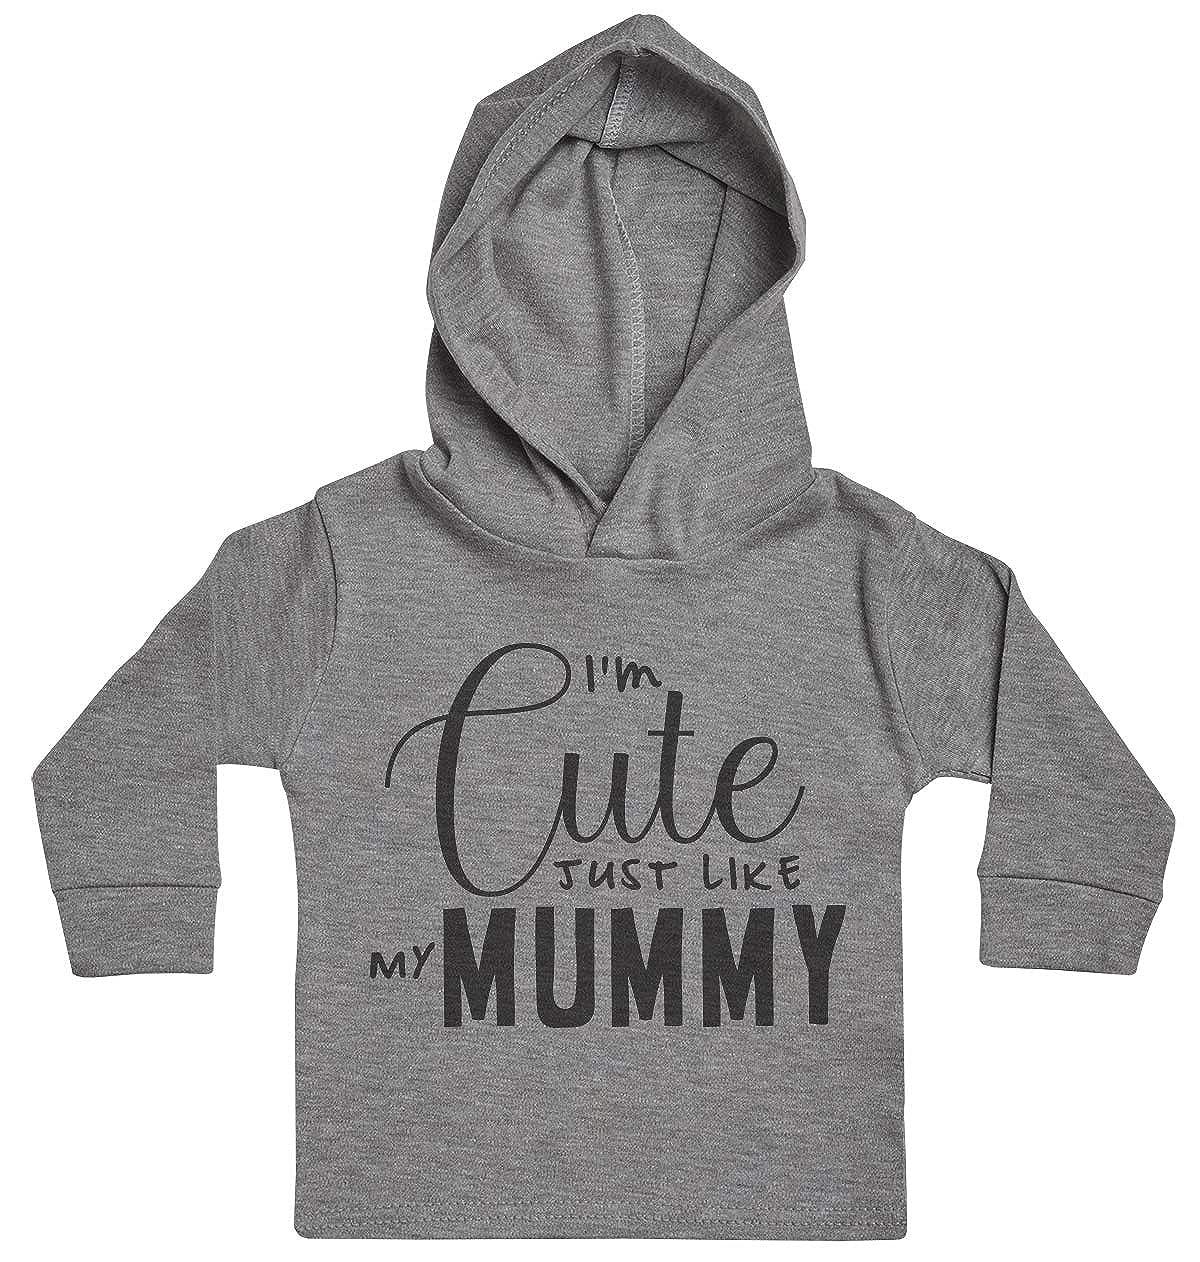 Baby Hoody Baby Girl Hoody Baby Gift Im Cute Just Like My Mummy Baby Boy Hoody Baby Clothing